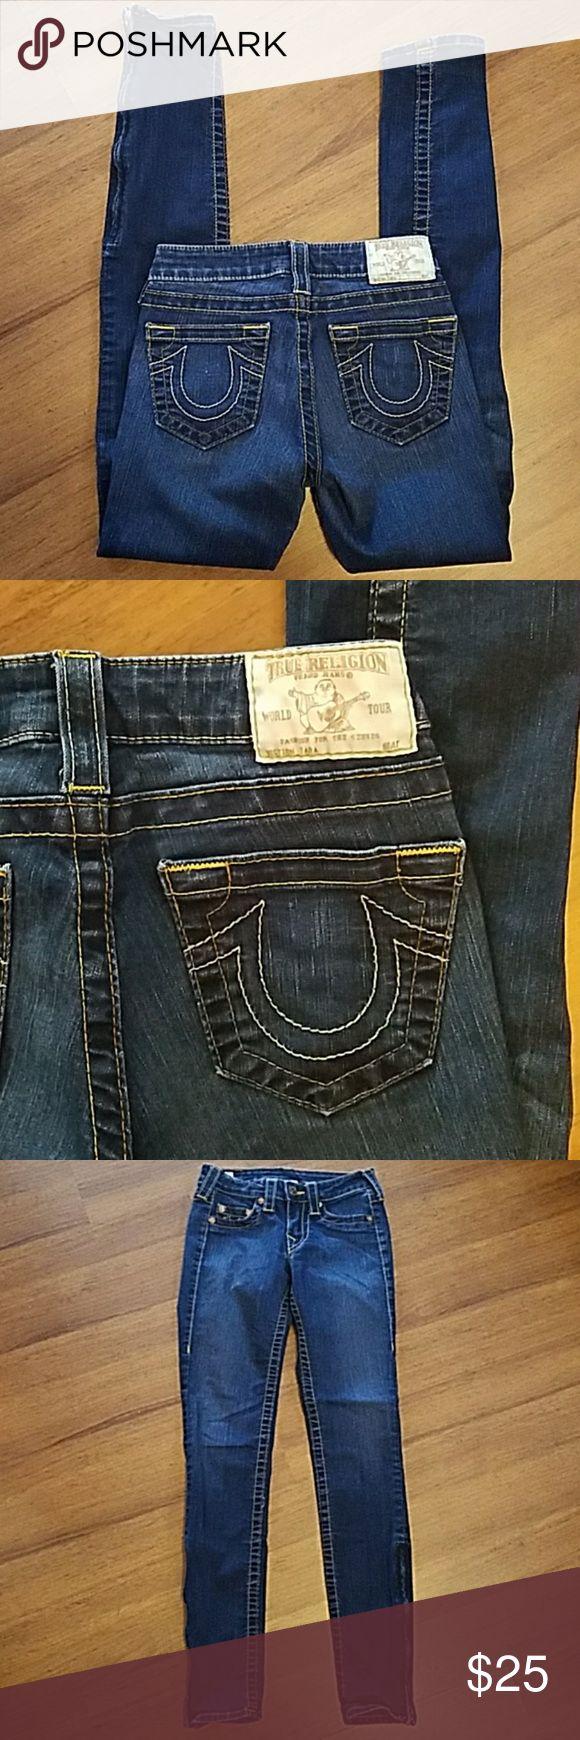 True Religion jeans size 24 Tara True Religion jeans size 24 Tara. Inseam is 29 inches. Skinny with zipper on each ankle. True Religion Jeans Skinny